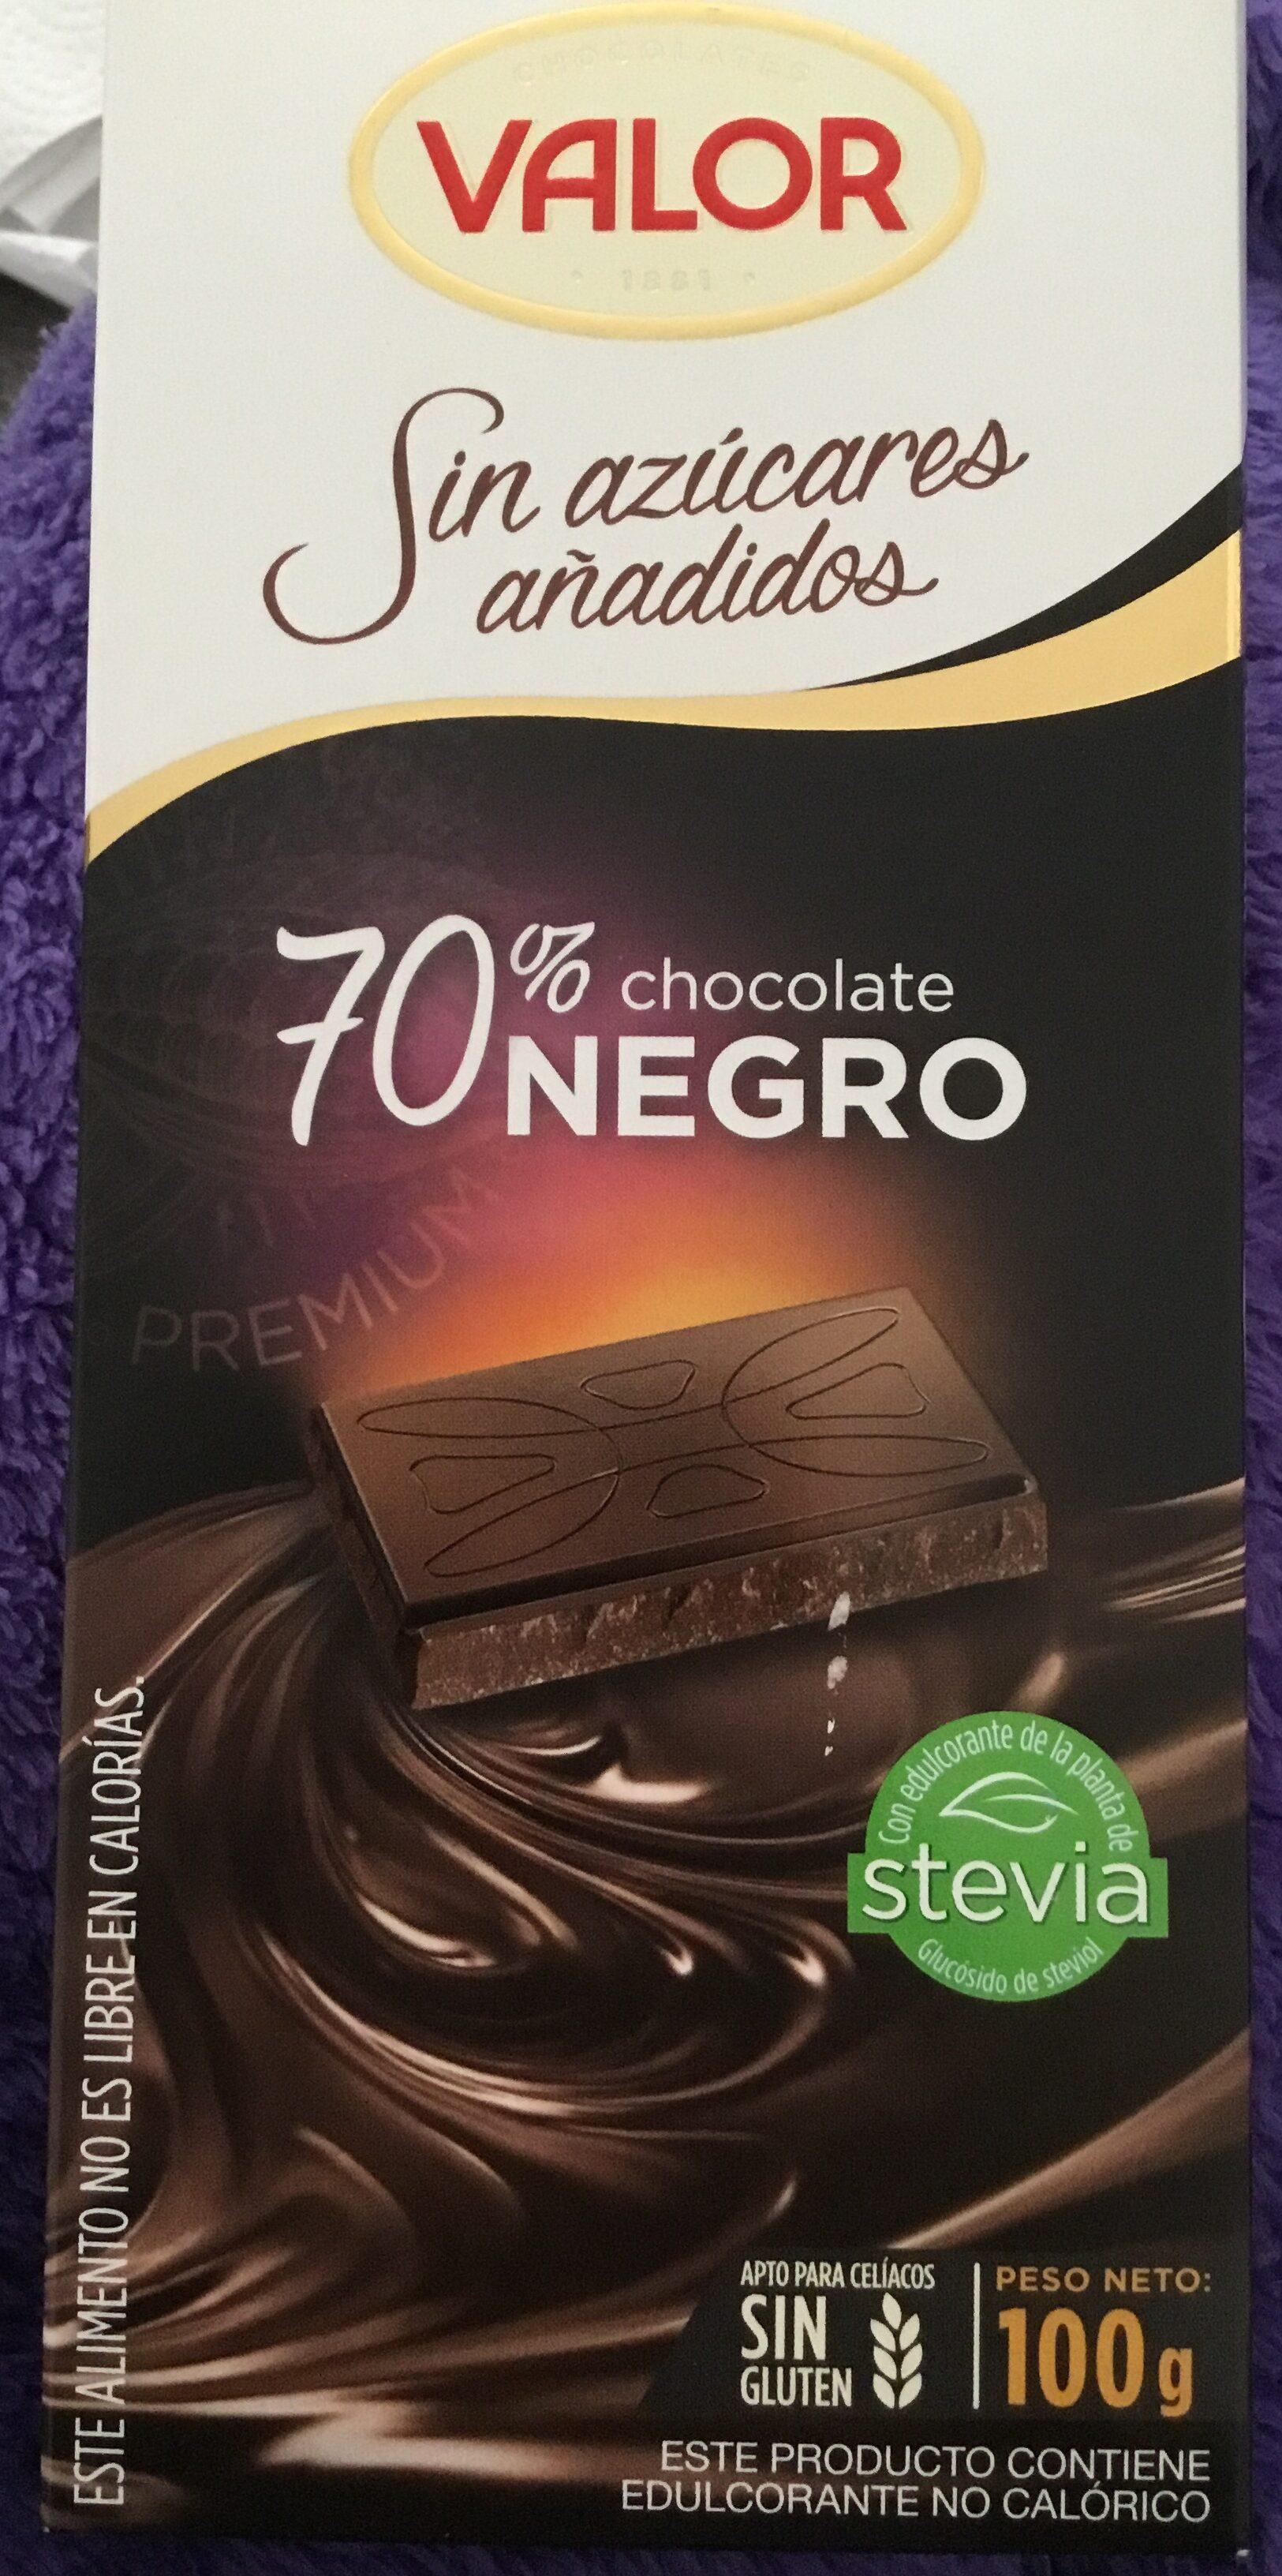 Chocolate negro 70% sugar free - Product - en